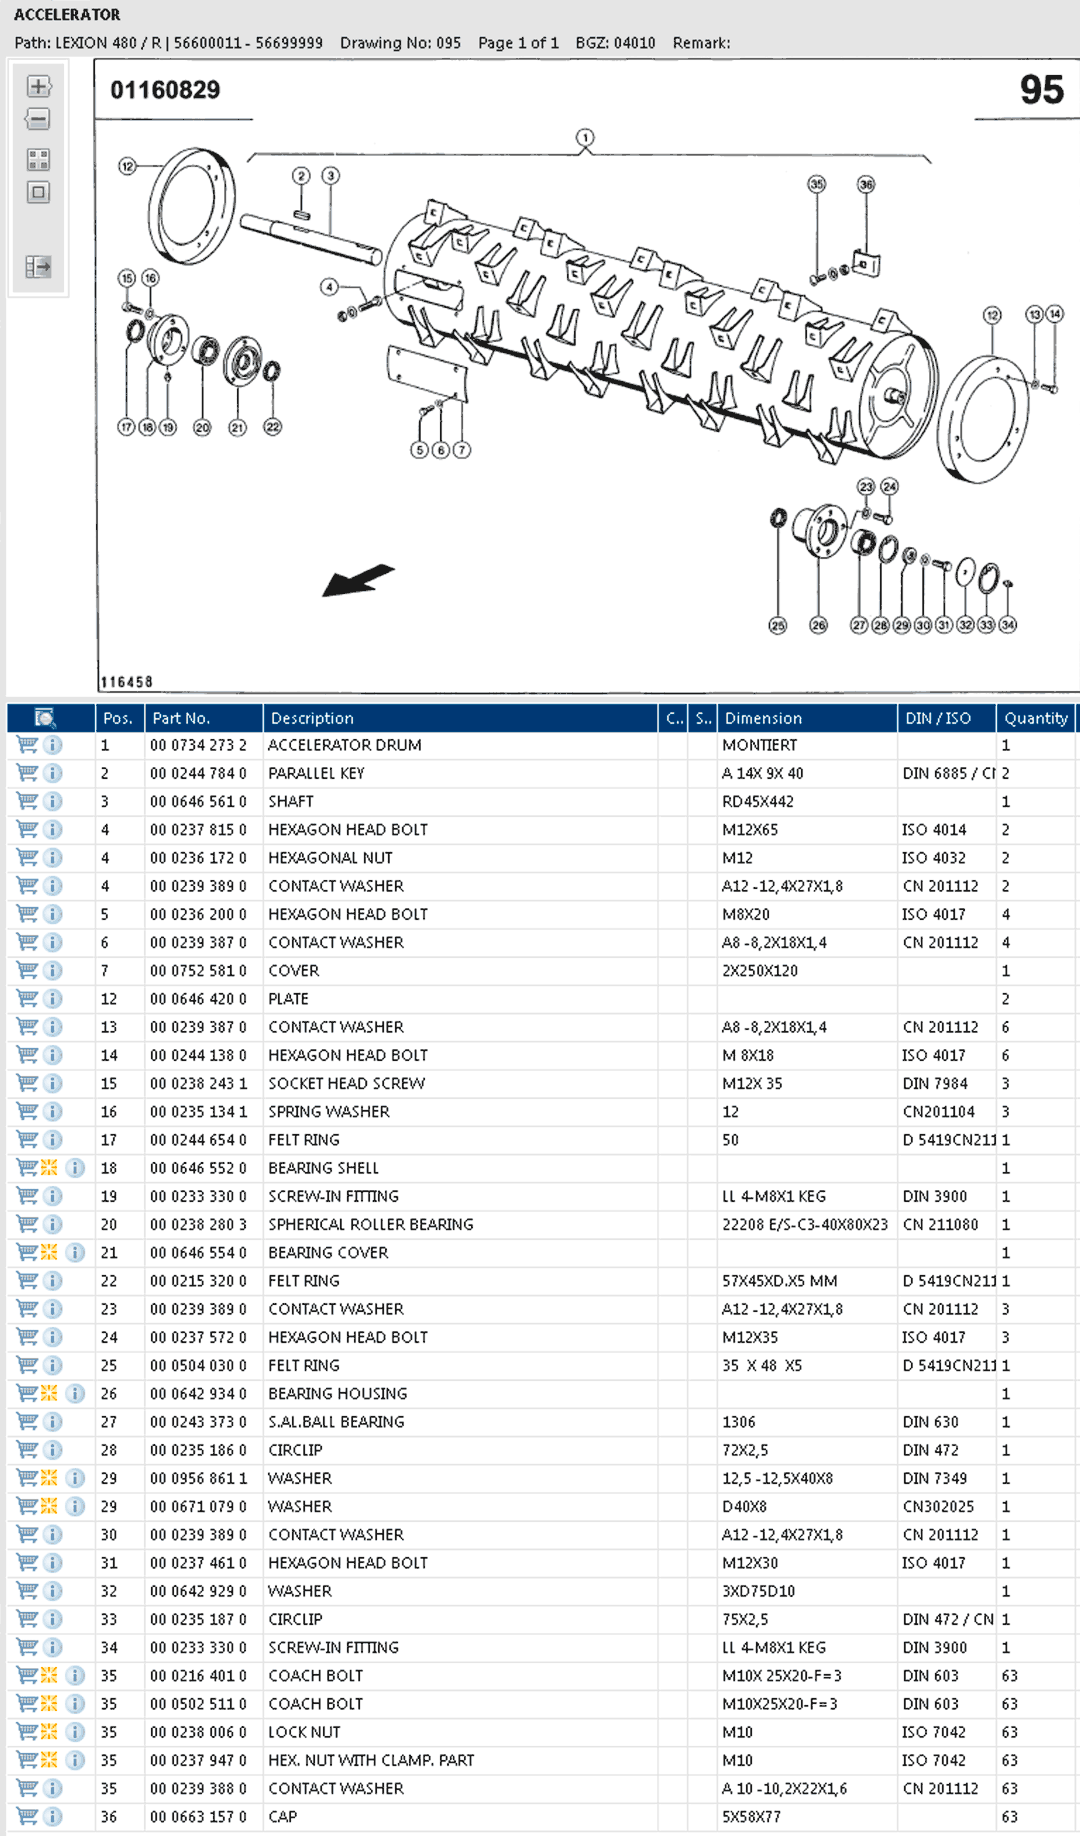 Lexion 480R parts and scheme - accelerator